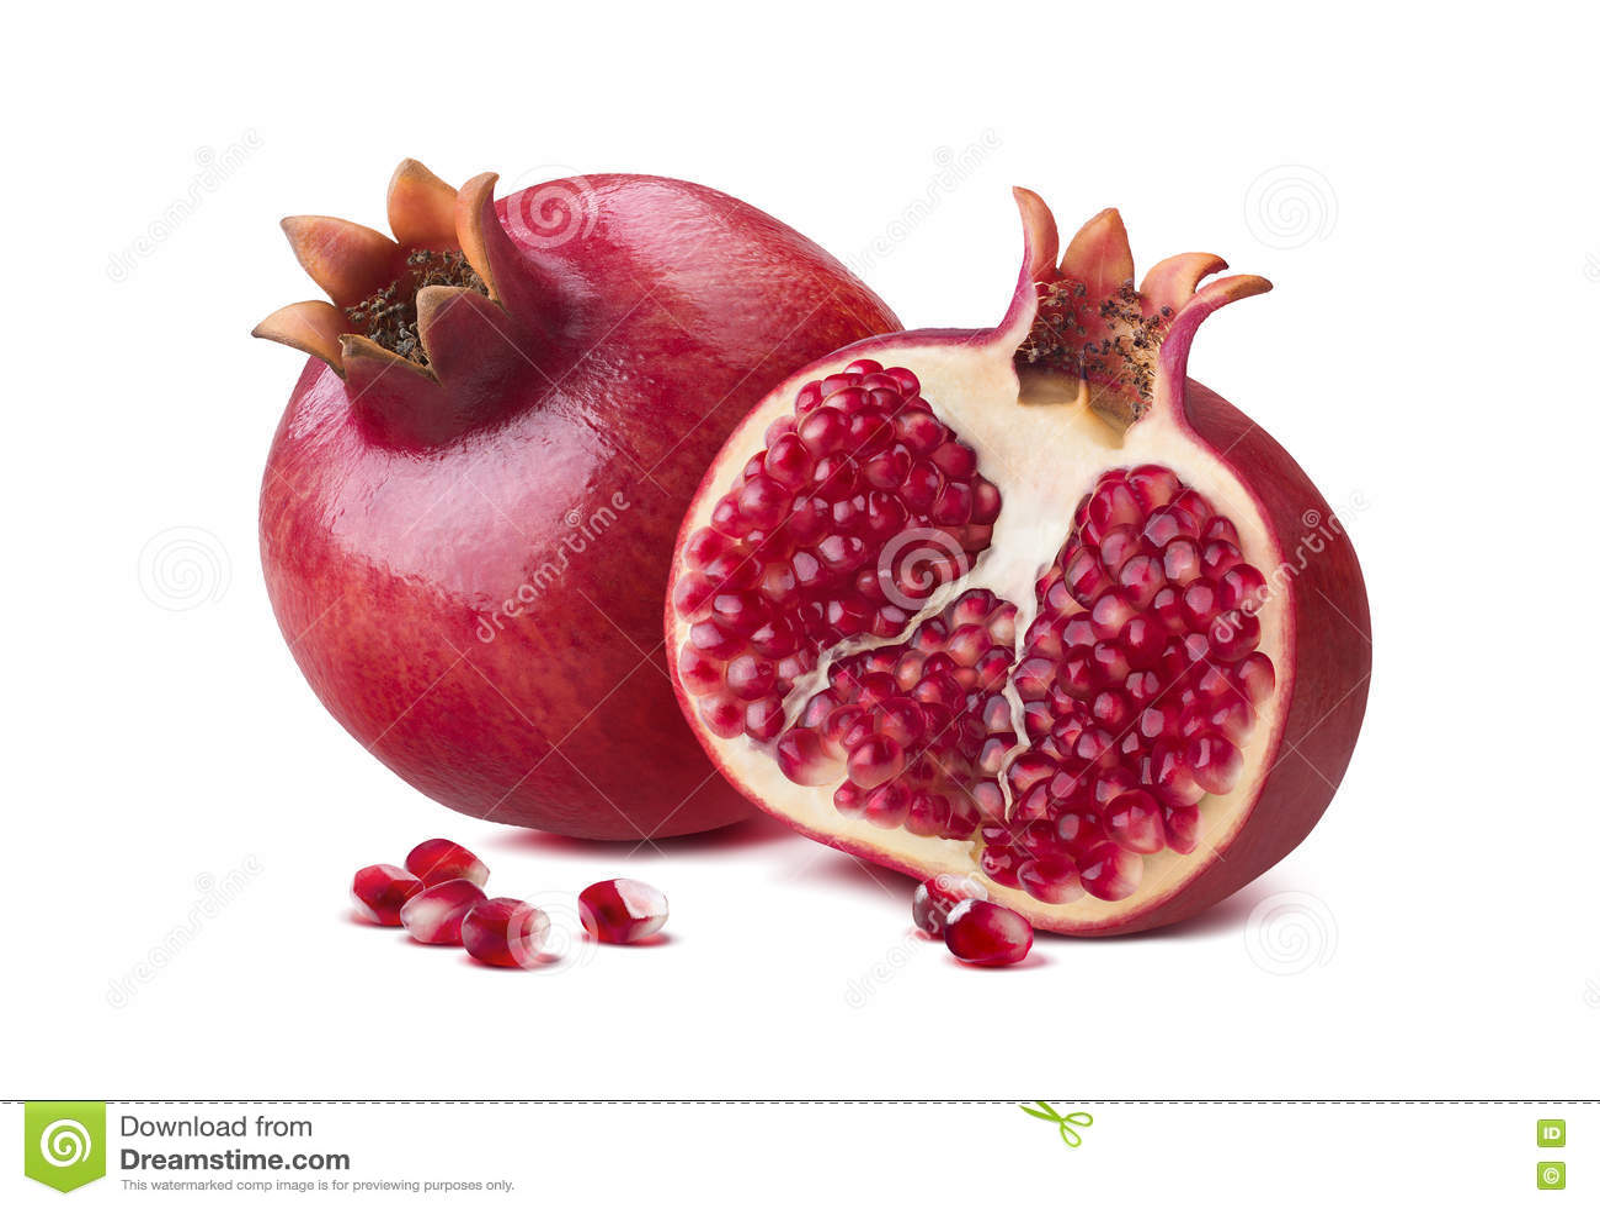 Whole pomegranate half seeds isolated on white